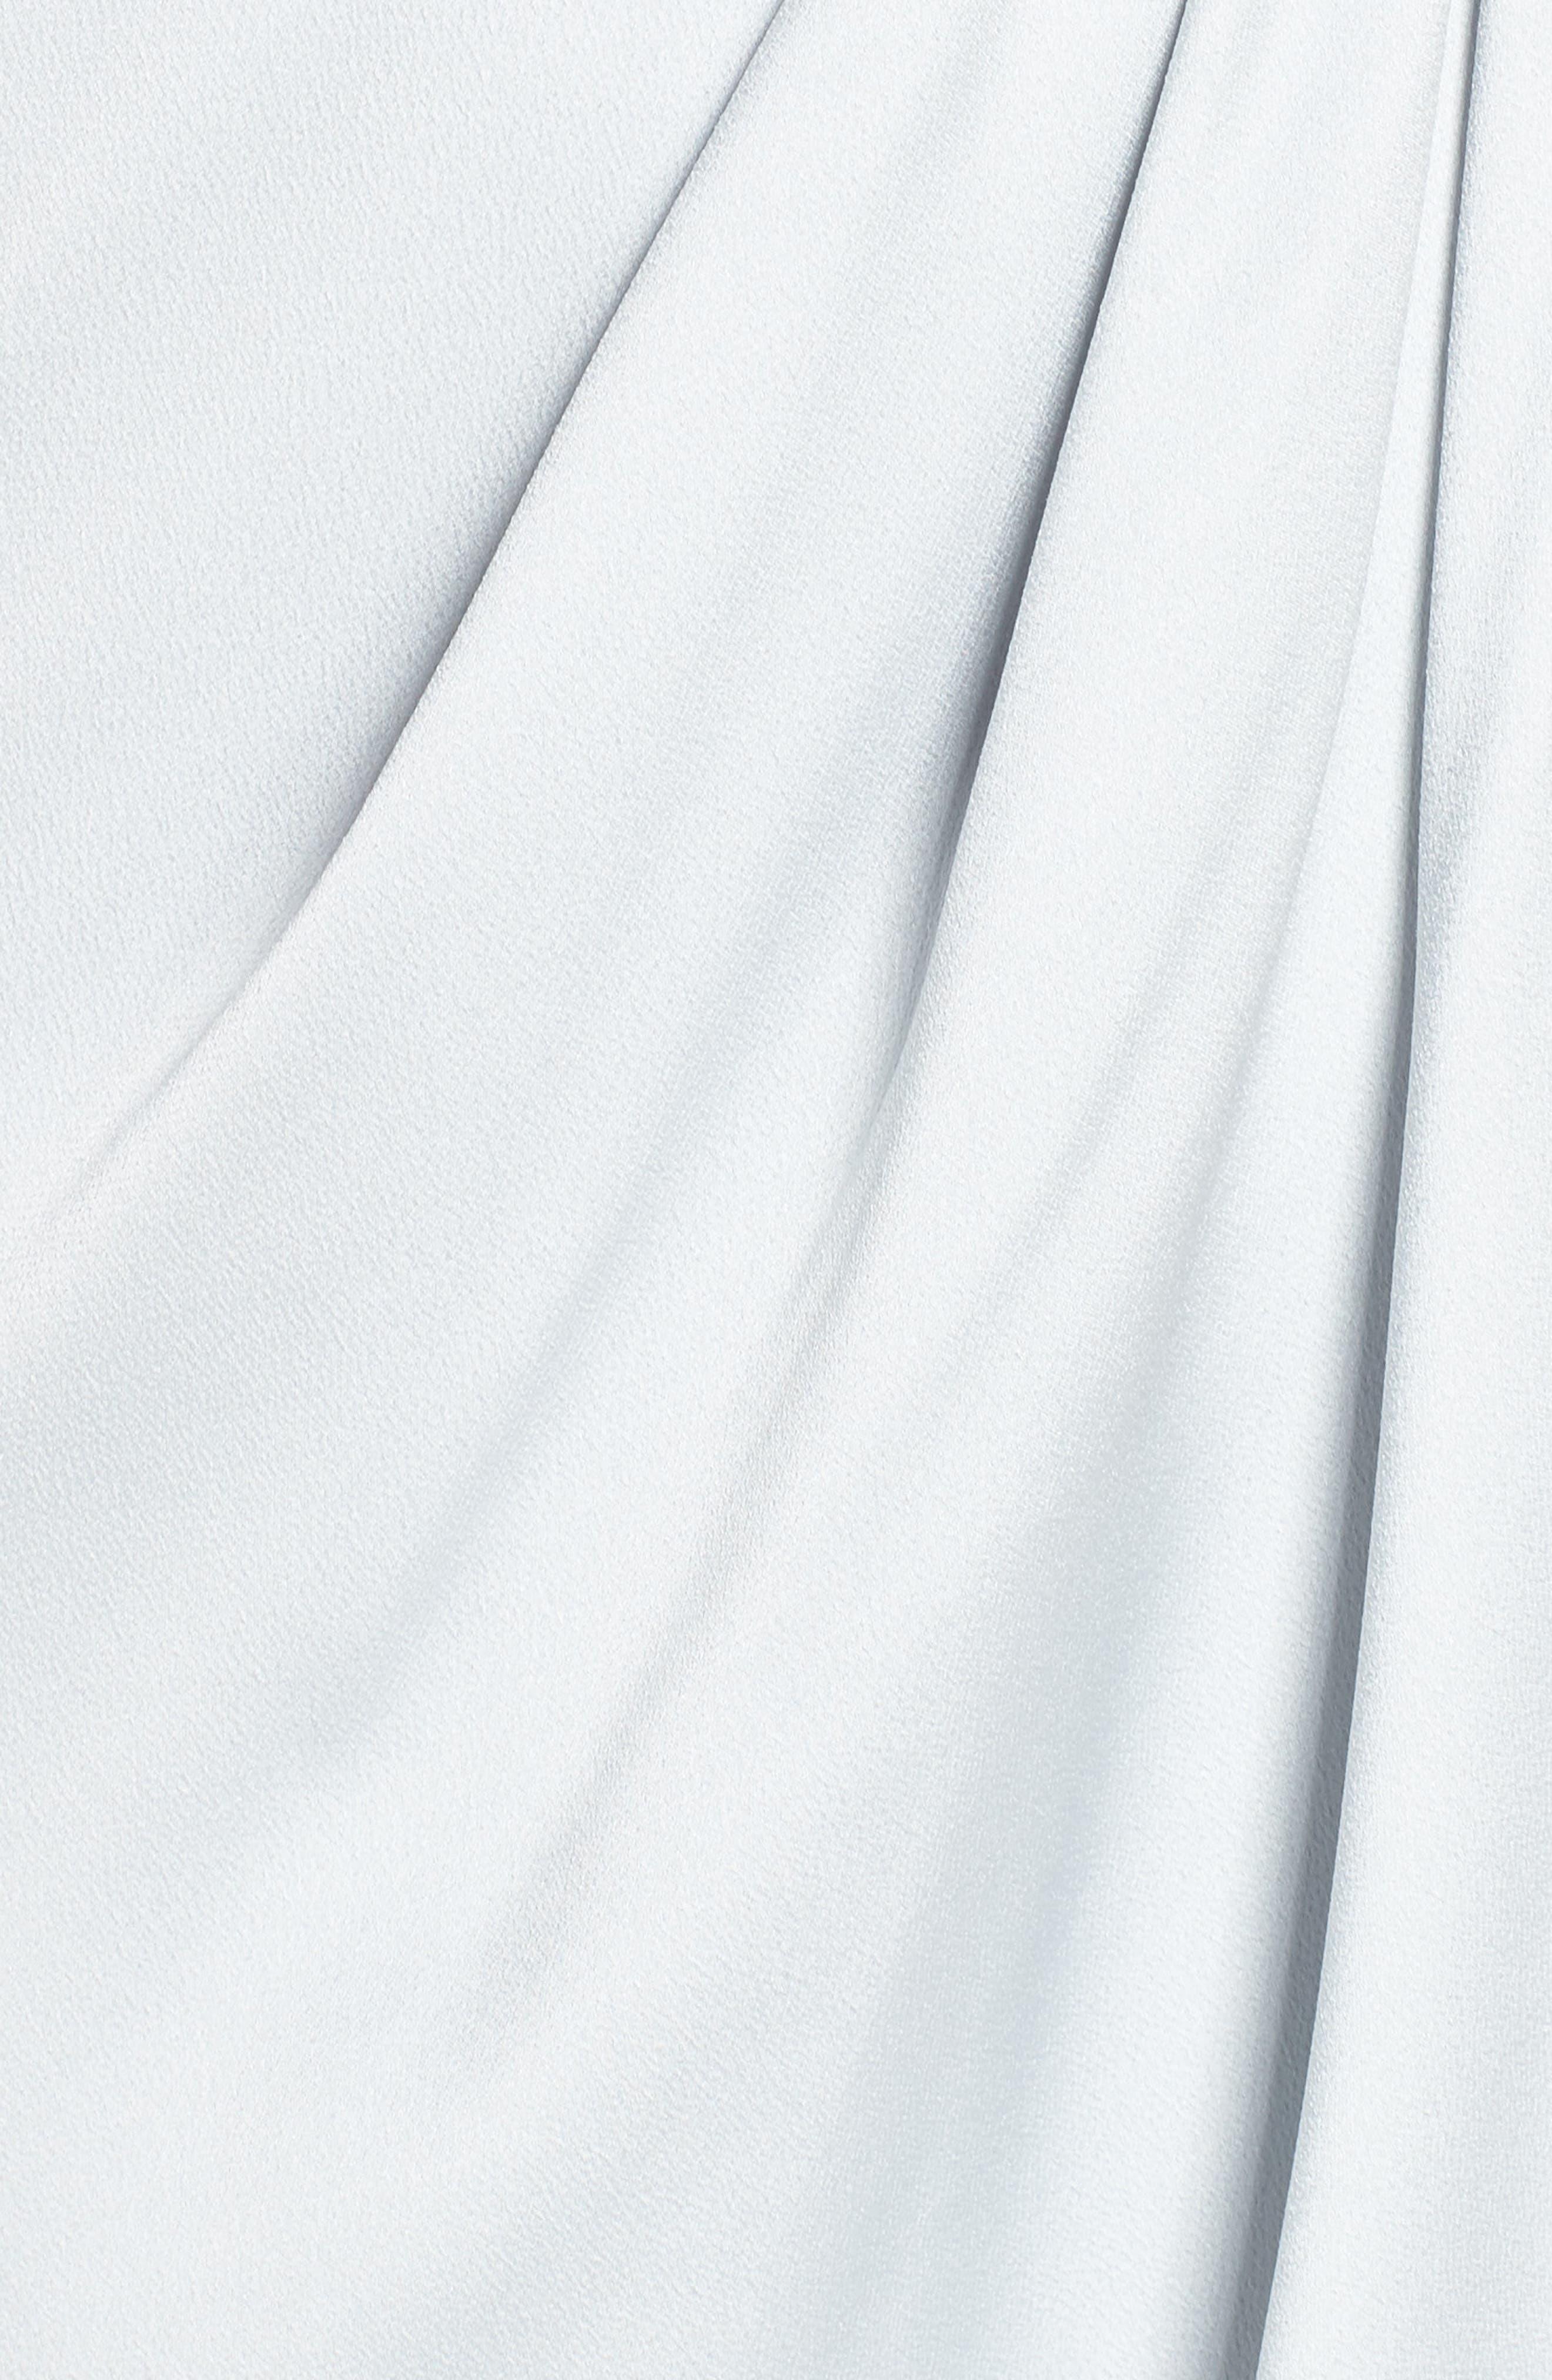 SHONA JOY, Luxe Frill Tulip Hem Maxi Dress, Alternate thumbnail 6, color, CLOUD